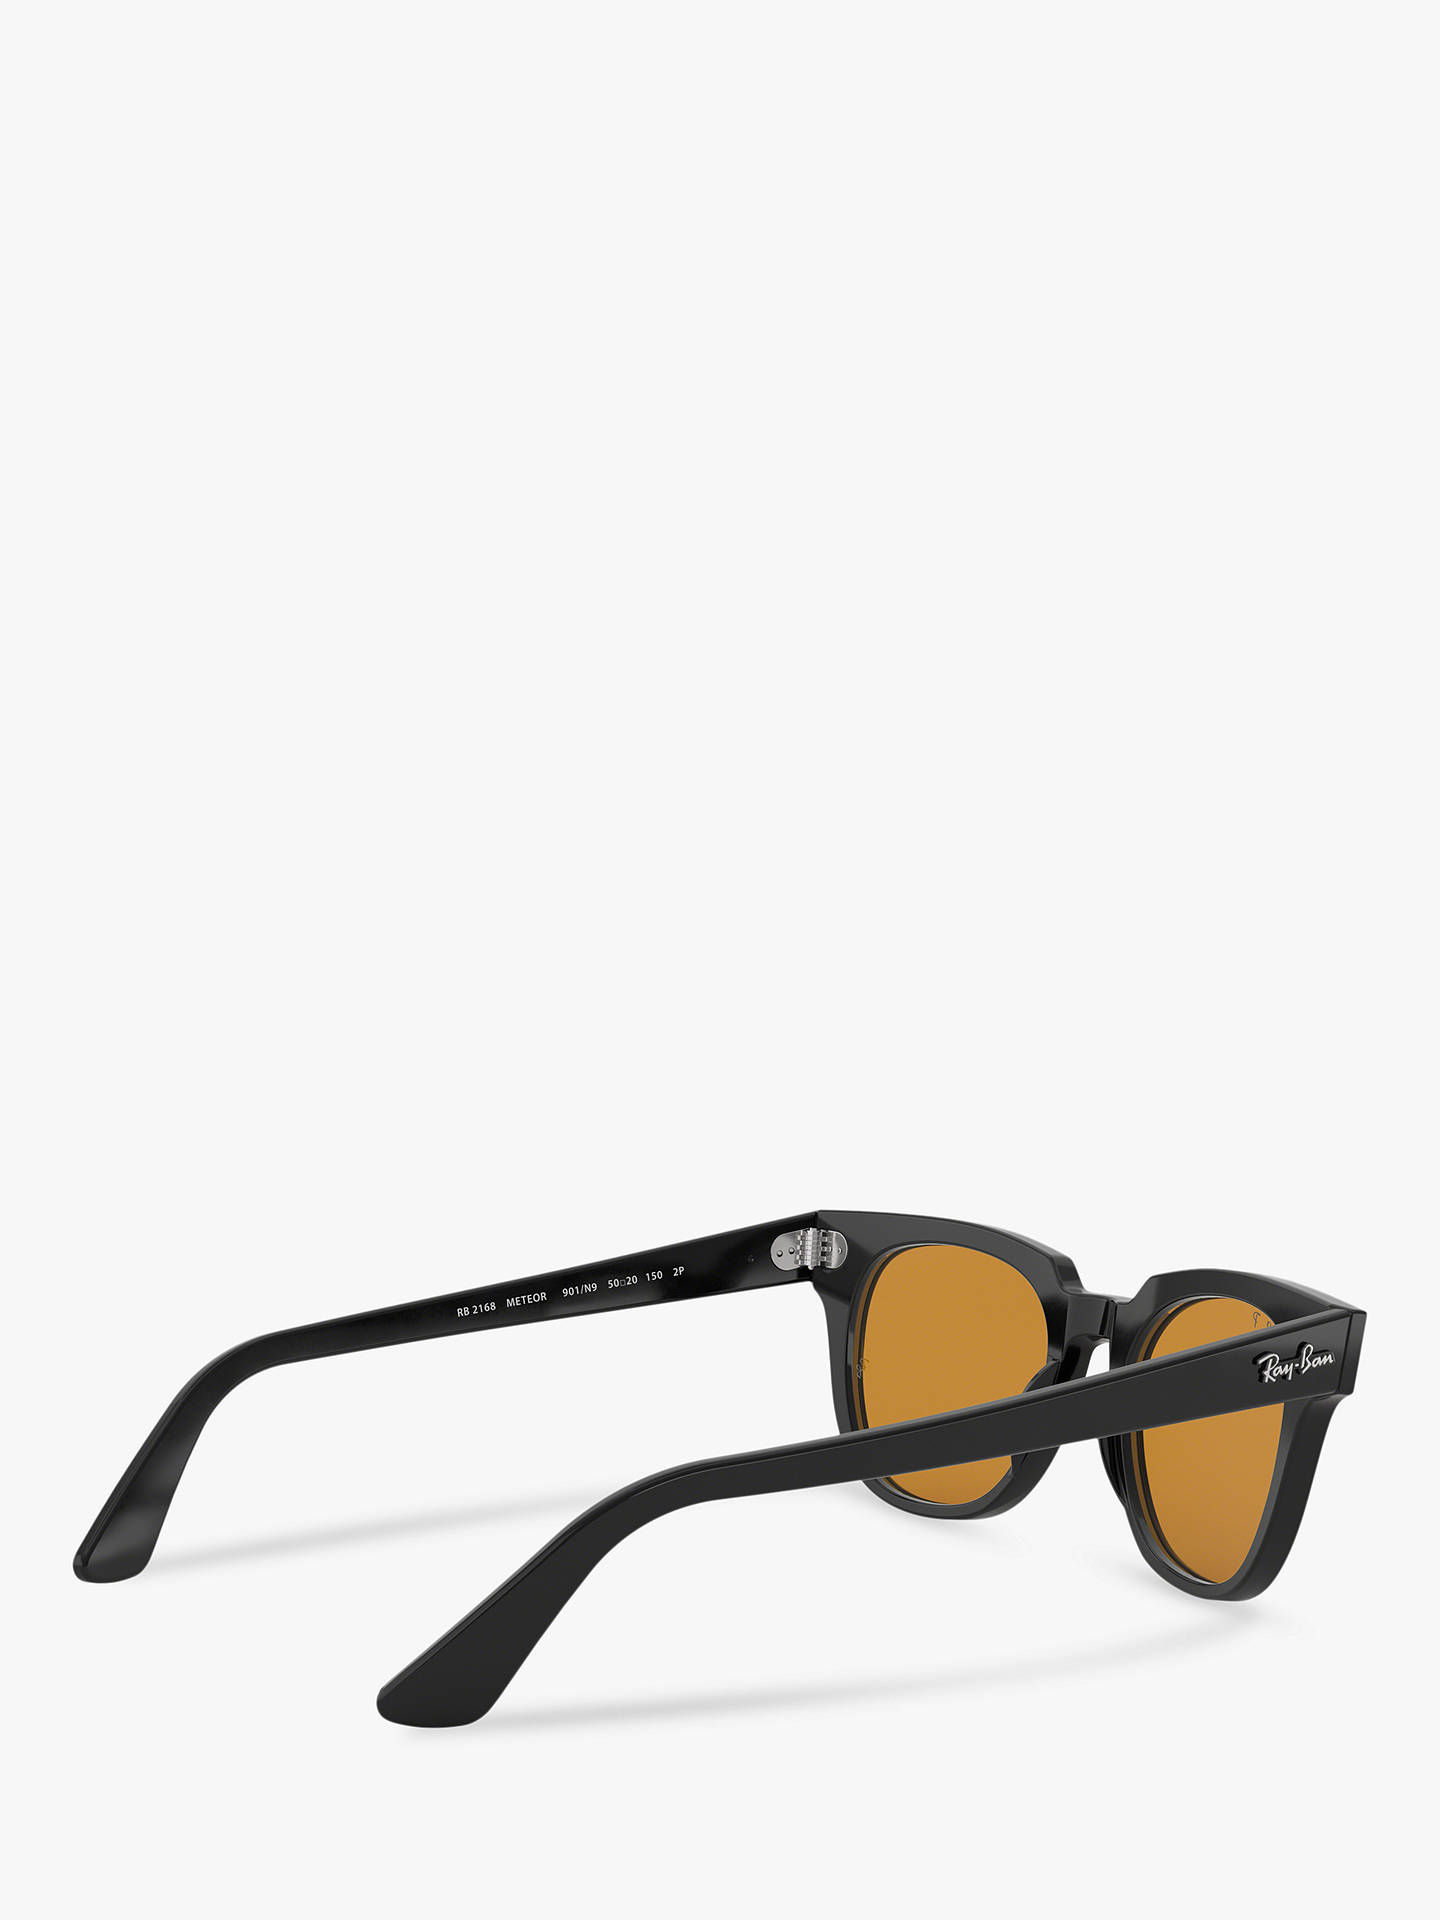 0fc0c0b3d1 Ray-Ban RB2168 Unisex Polarised Square Sunglasses at John Lewis ...